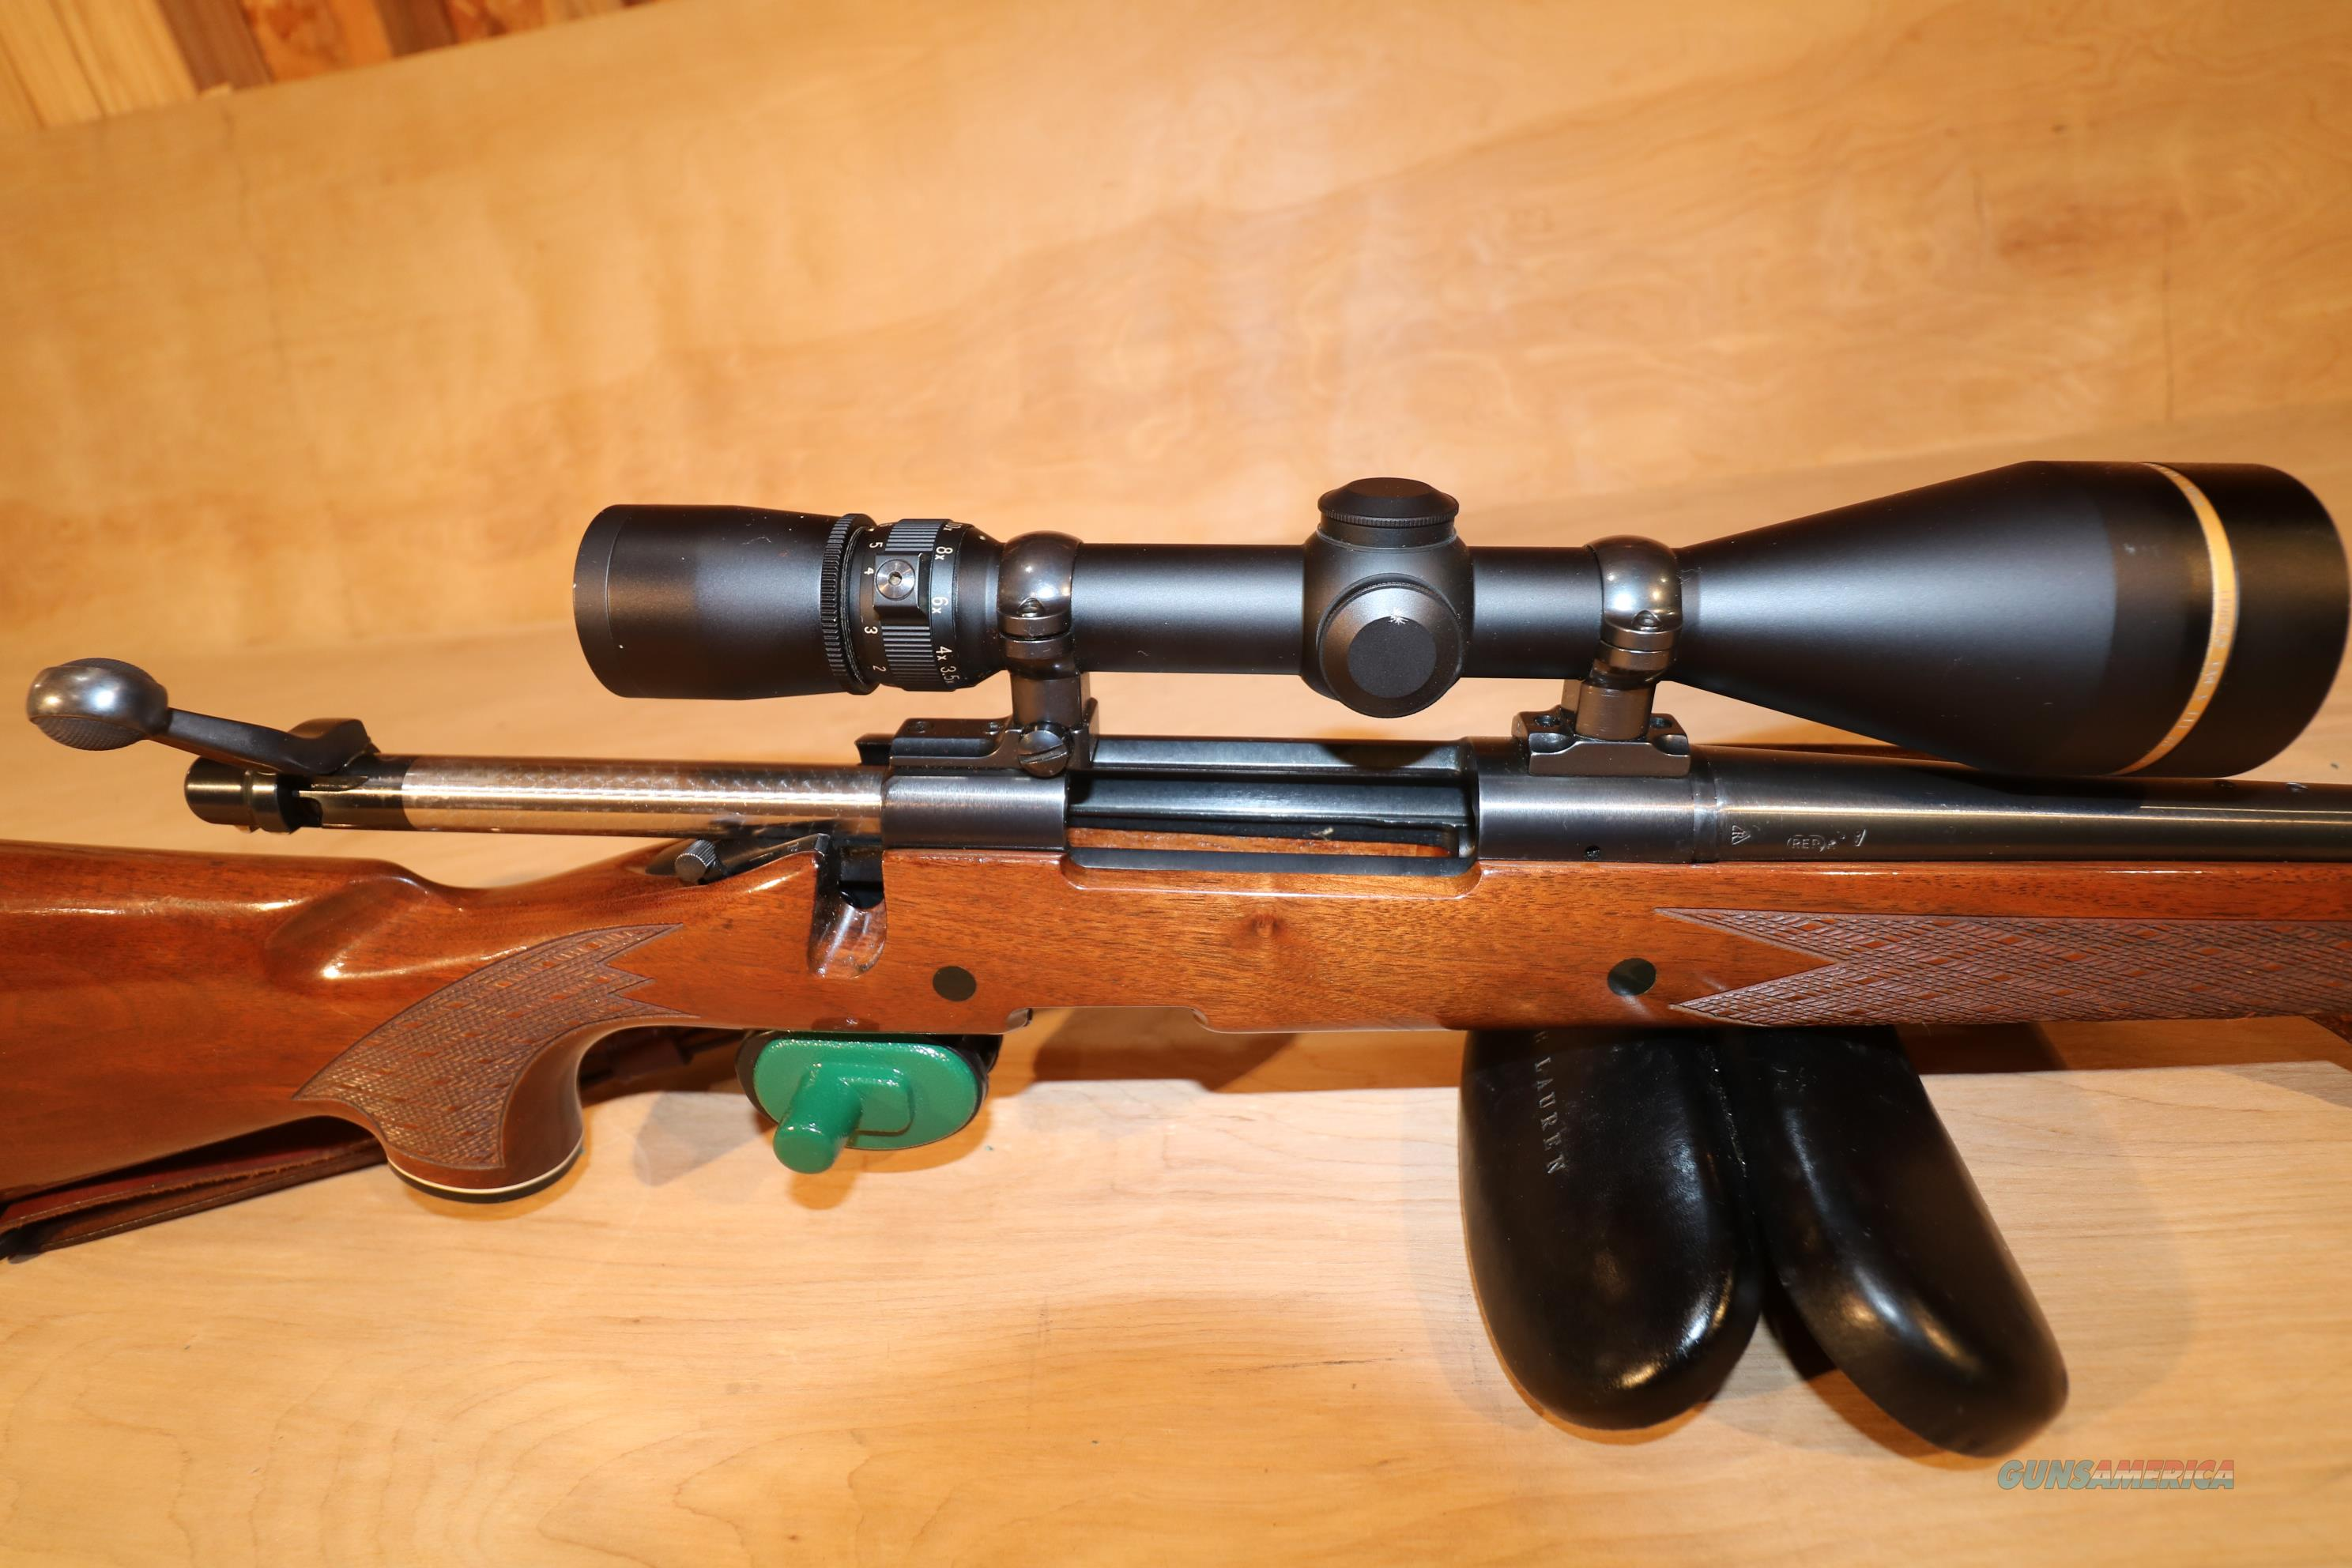 Remington Bolt Action - Model 700 300 Magnum with Scope  Guns > Rifles > Remington Rifles - Modern > Model 700 > Sporting